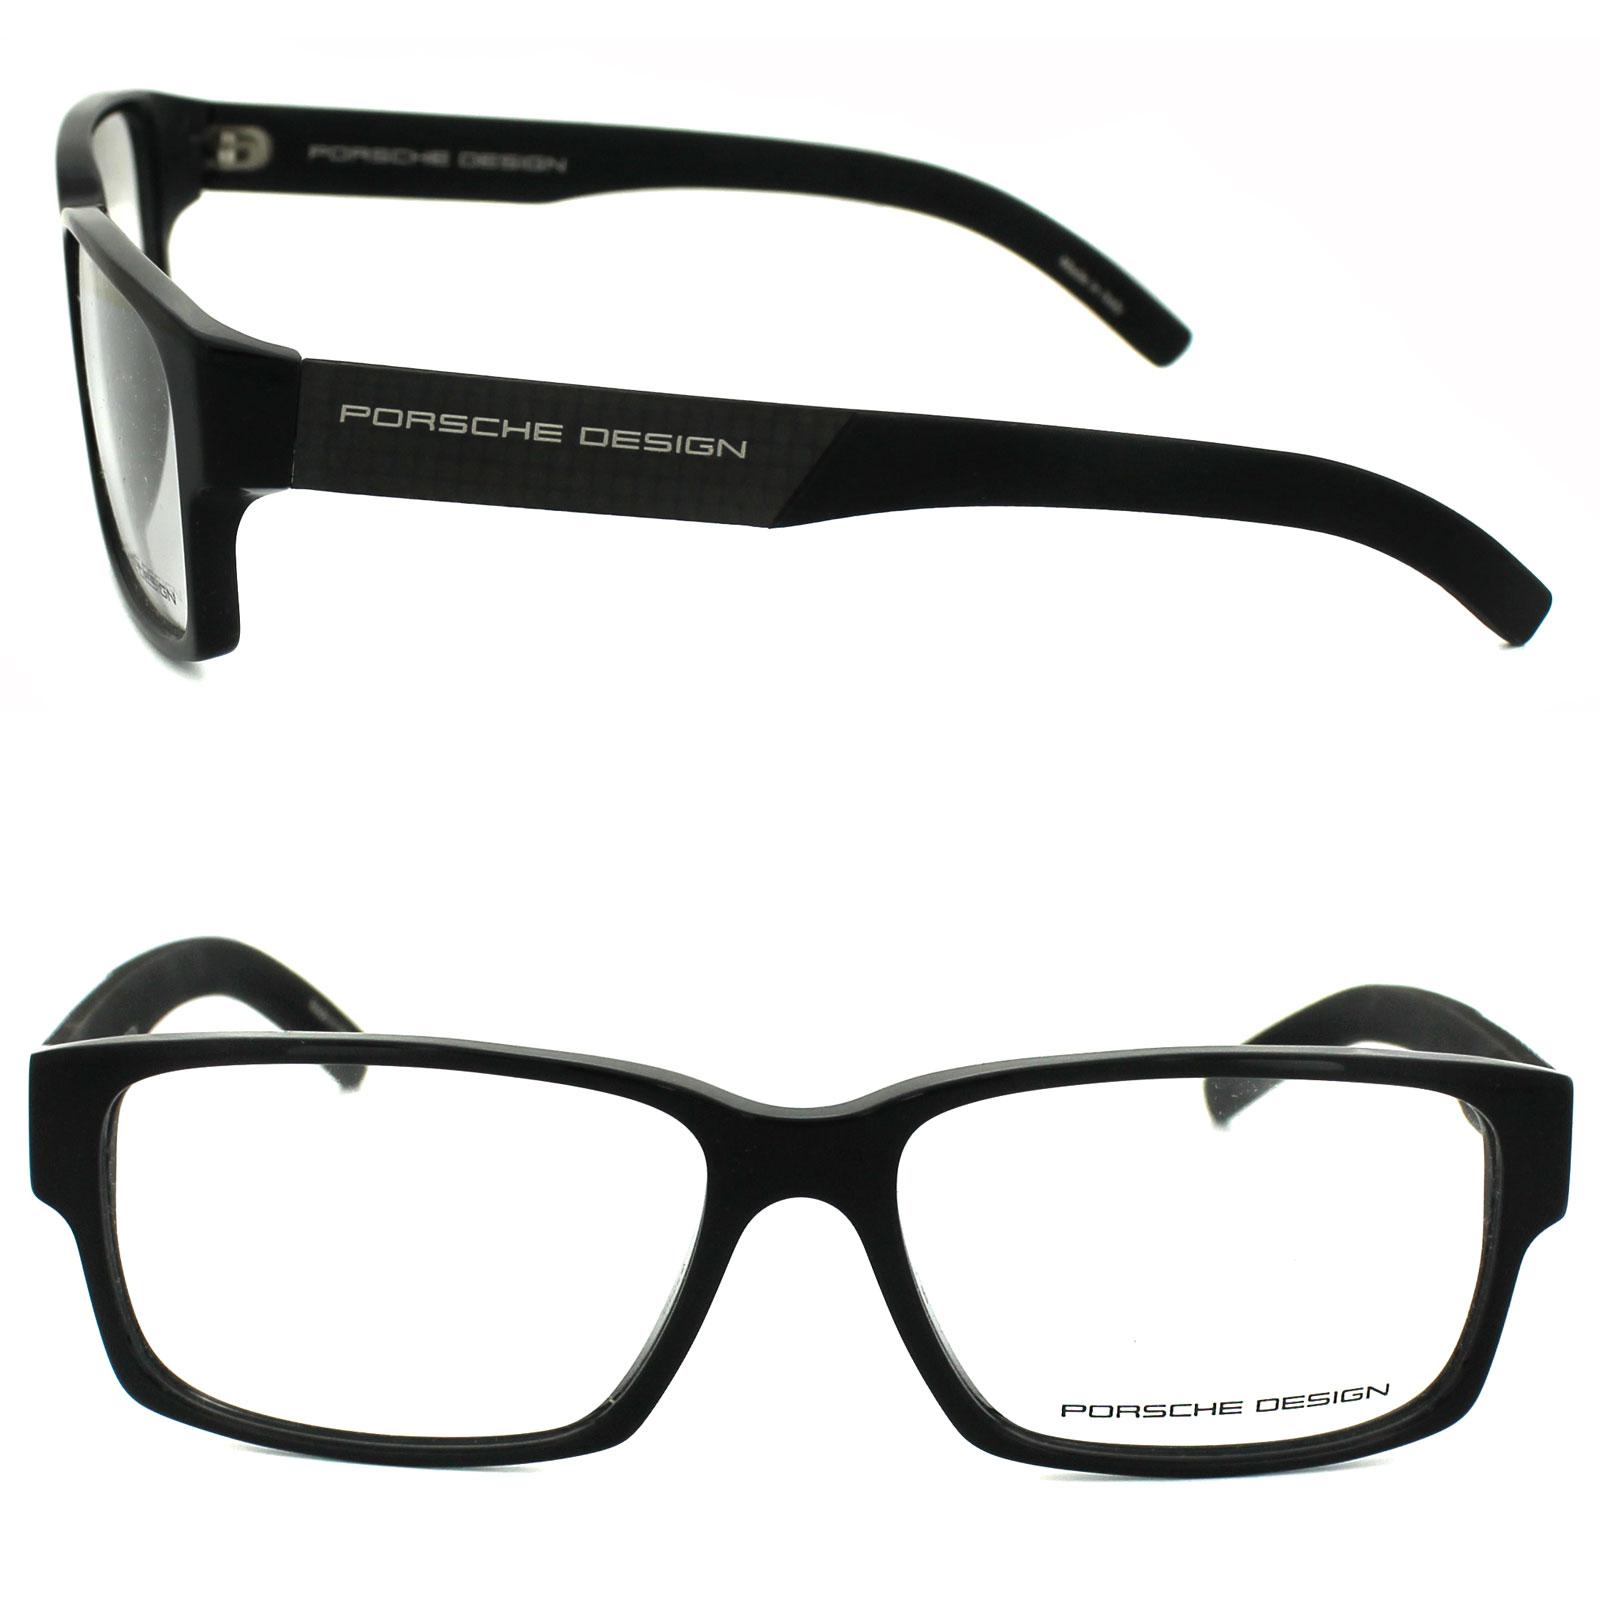 cheap porsche design p8241 glasses frames discounted